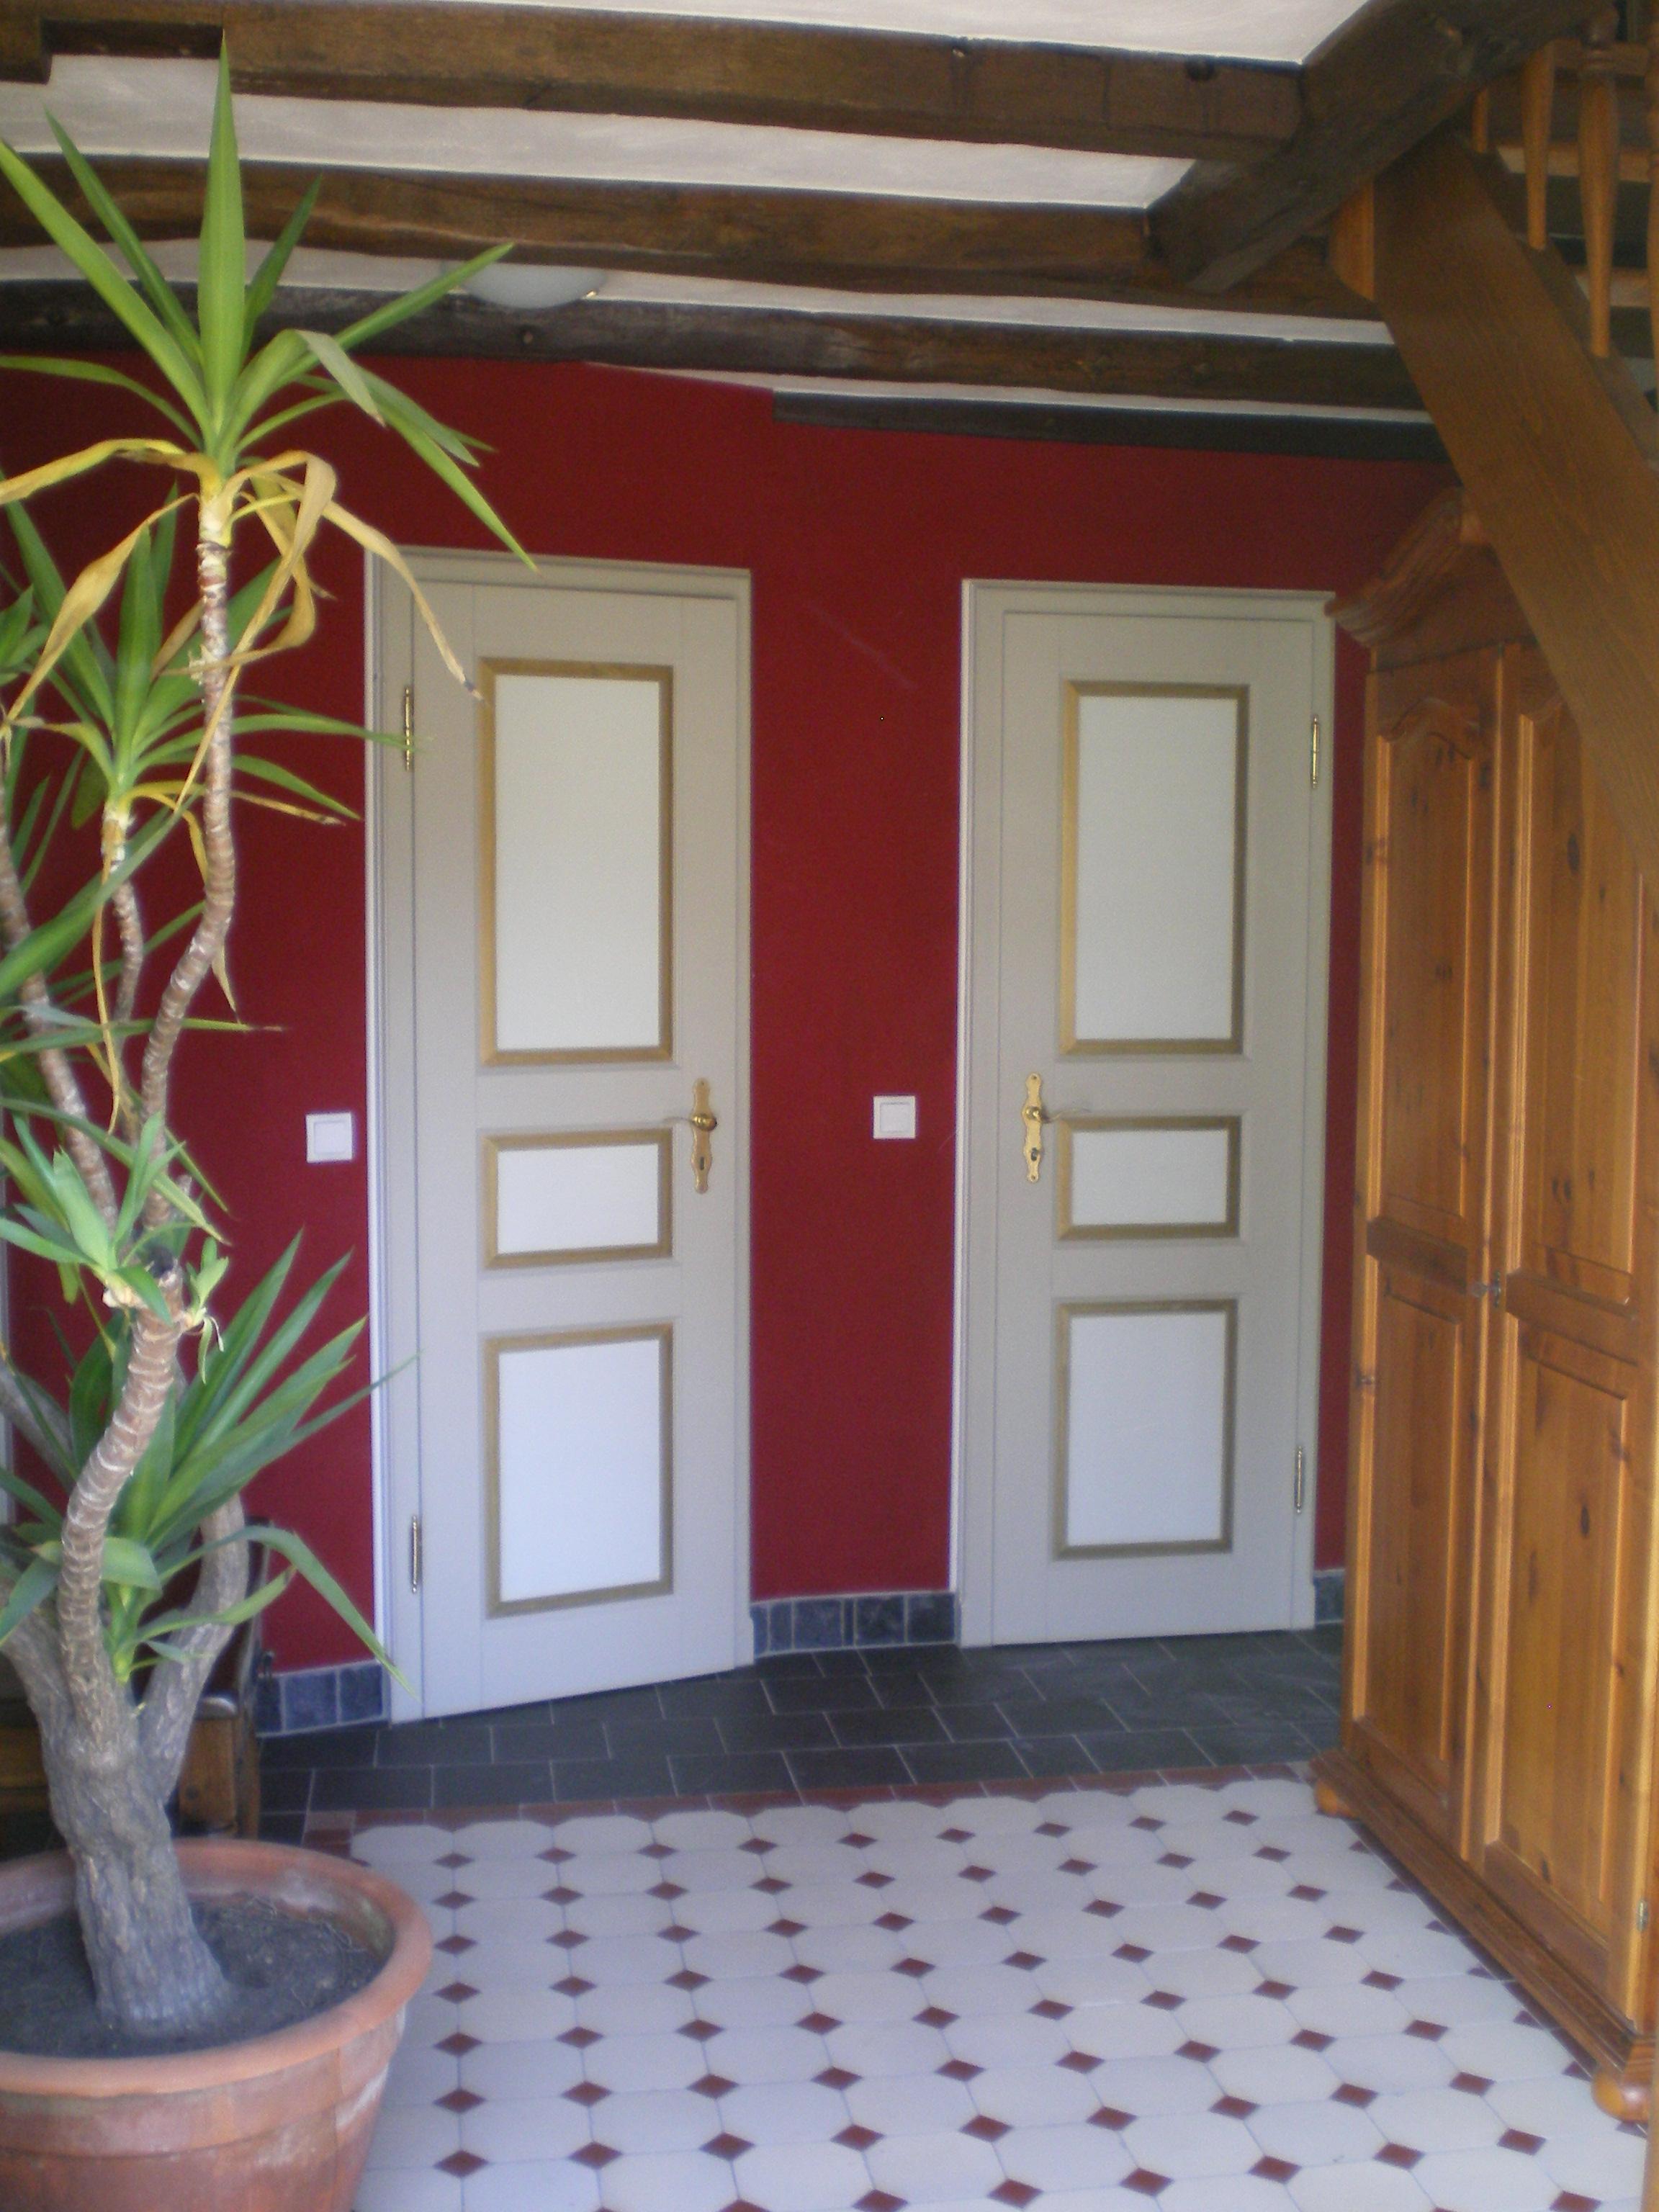 linke Tür: WC rechte Tür: Abstellraum